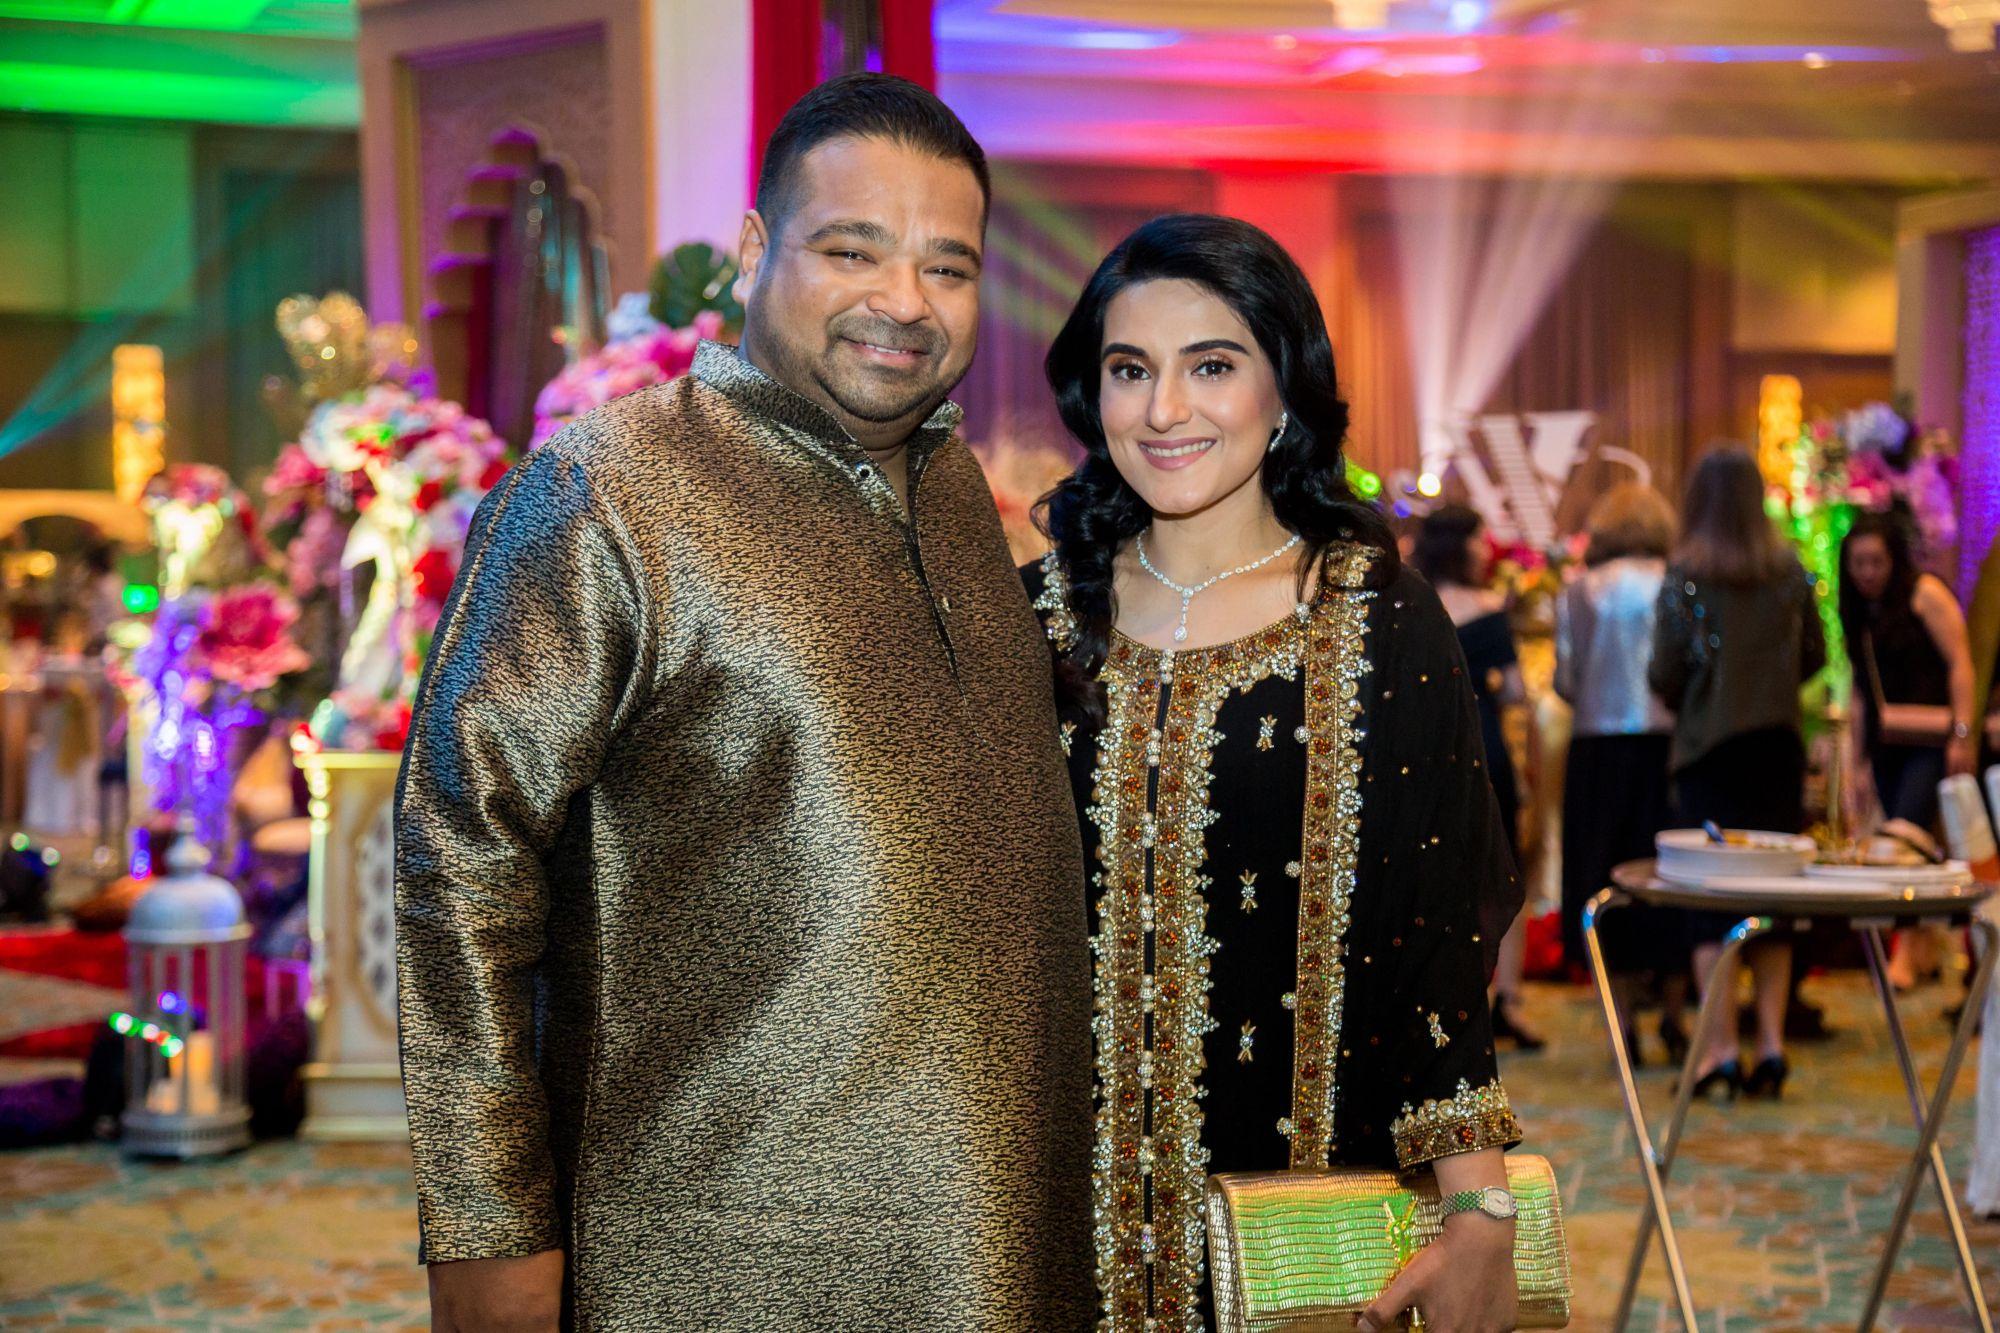 Datuk Shamrat Sen Gupta and Datin Safira Gupta